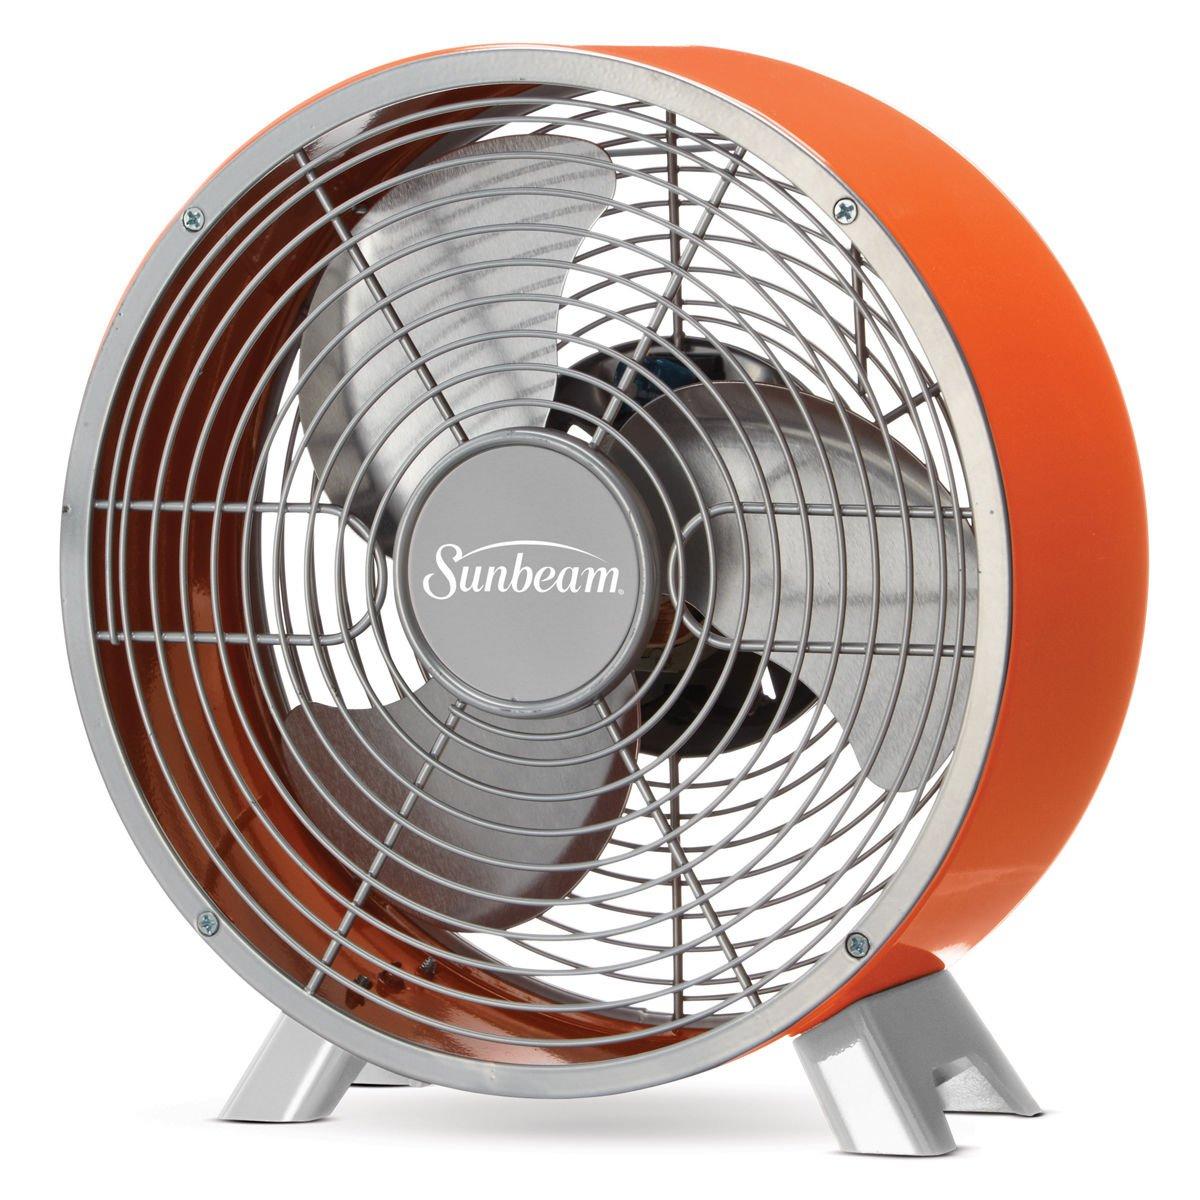 Sunbeam Designer Series Retro 9 Inch Table Fan, Teal SDF0914T CN:  Amazon.ca: Home U0026 Kitchen